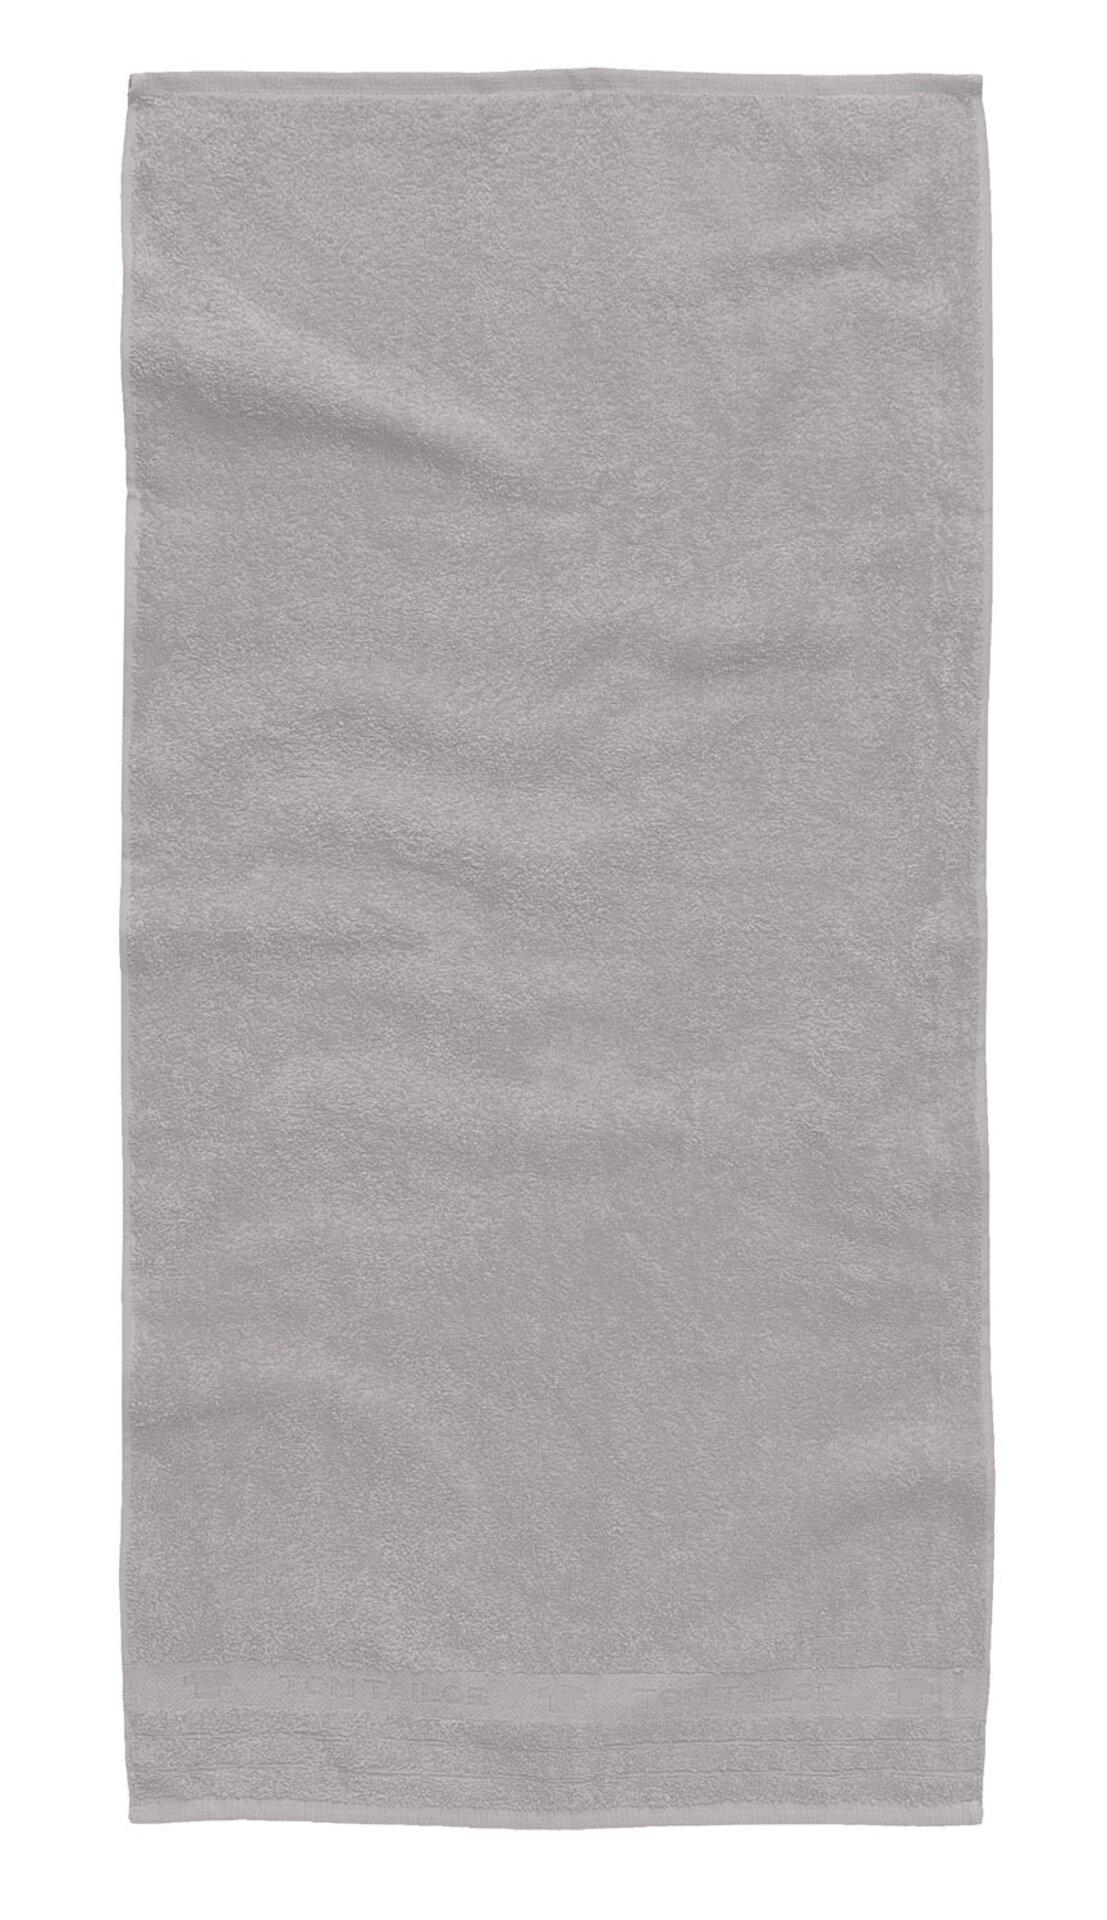 Duschtuch Uni Towel Tom Tailor Textil silber 70 x 140 cm